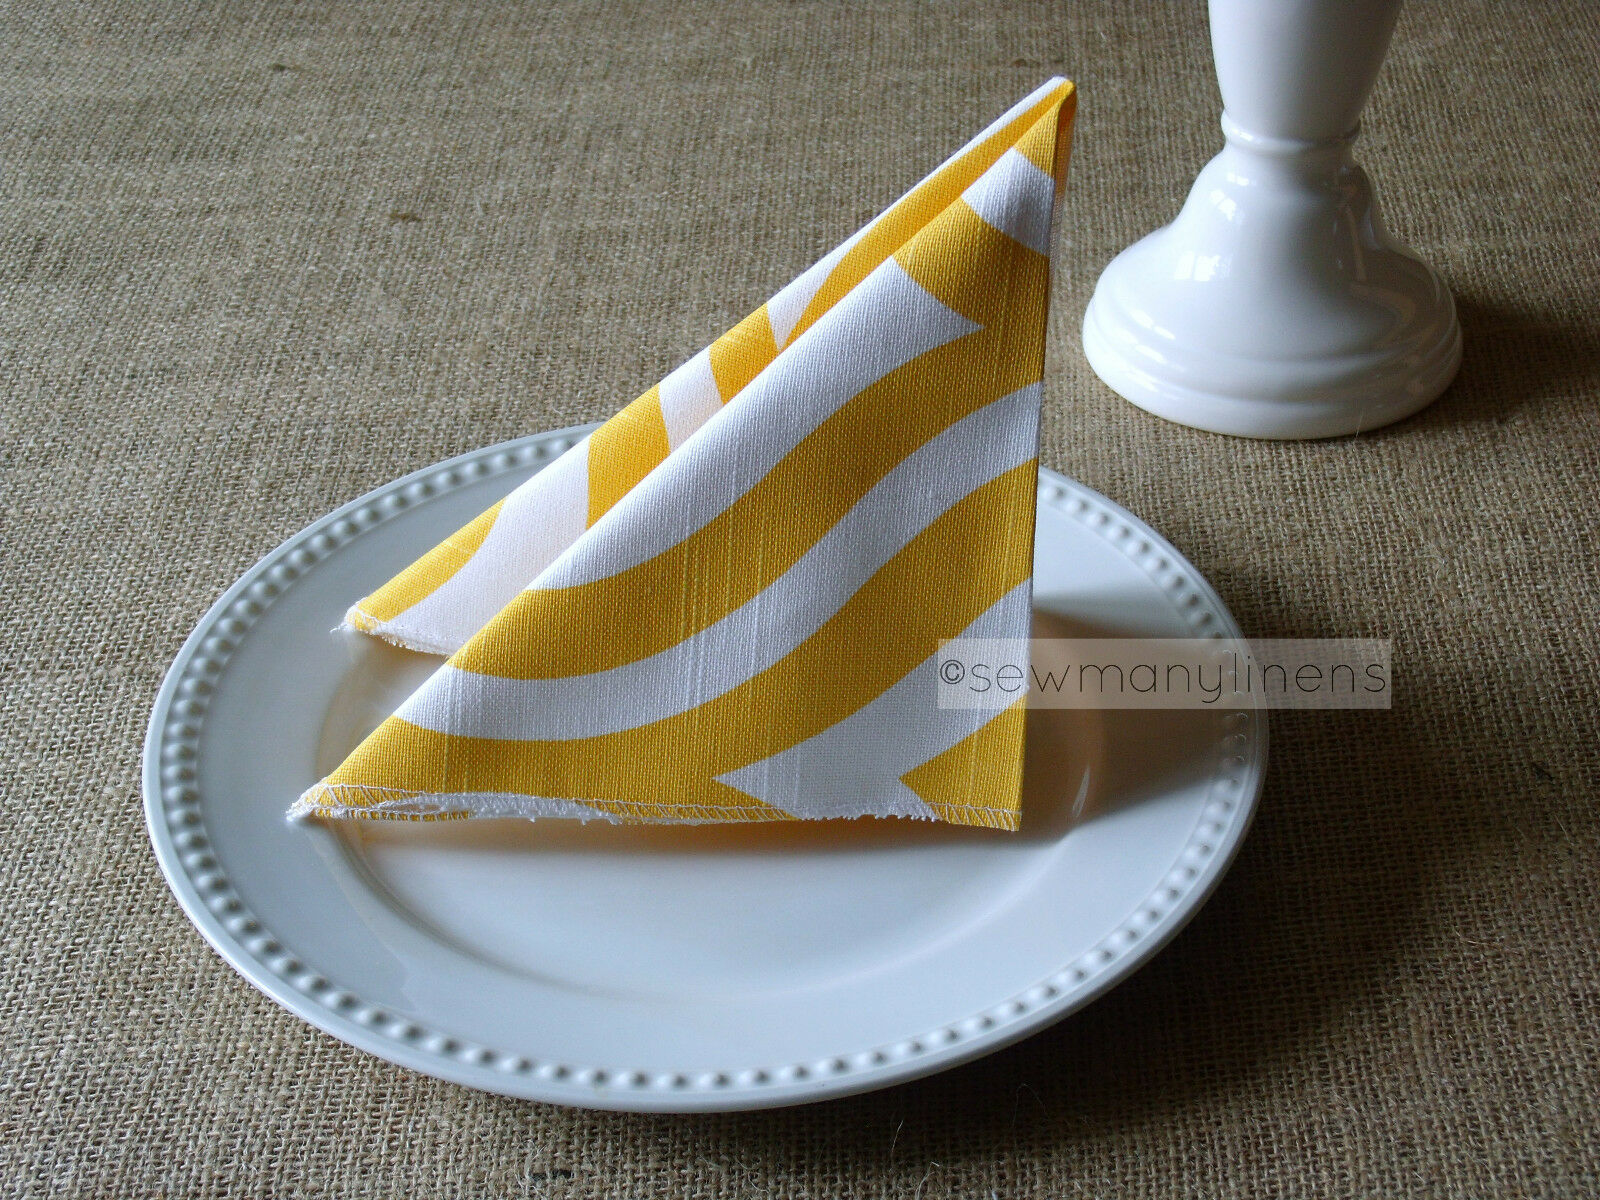 Yellow Napkins Wedding Table Centerpiece Linens Decor Modern Geometric Napkins For Sale Online